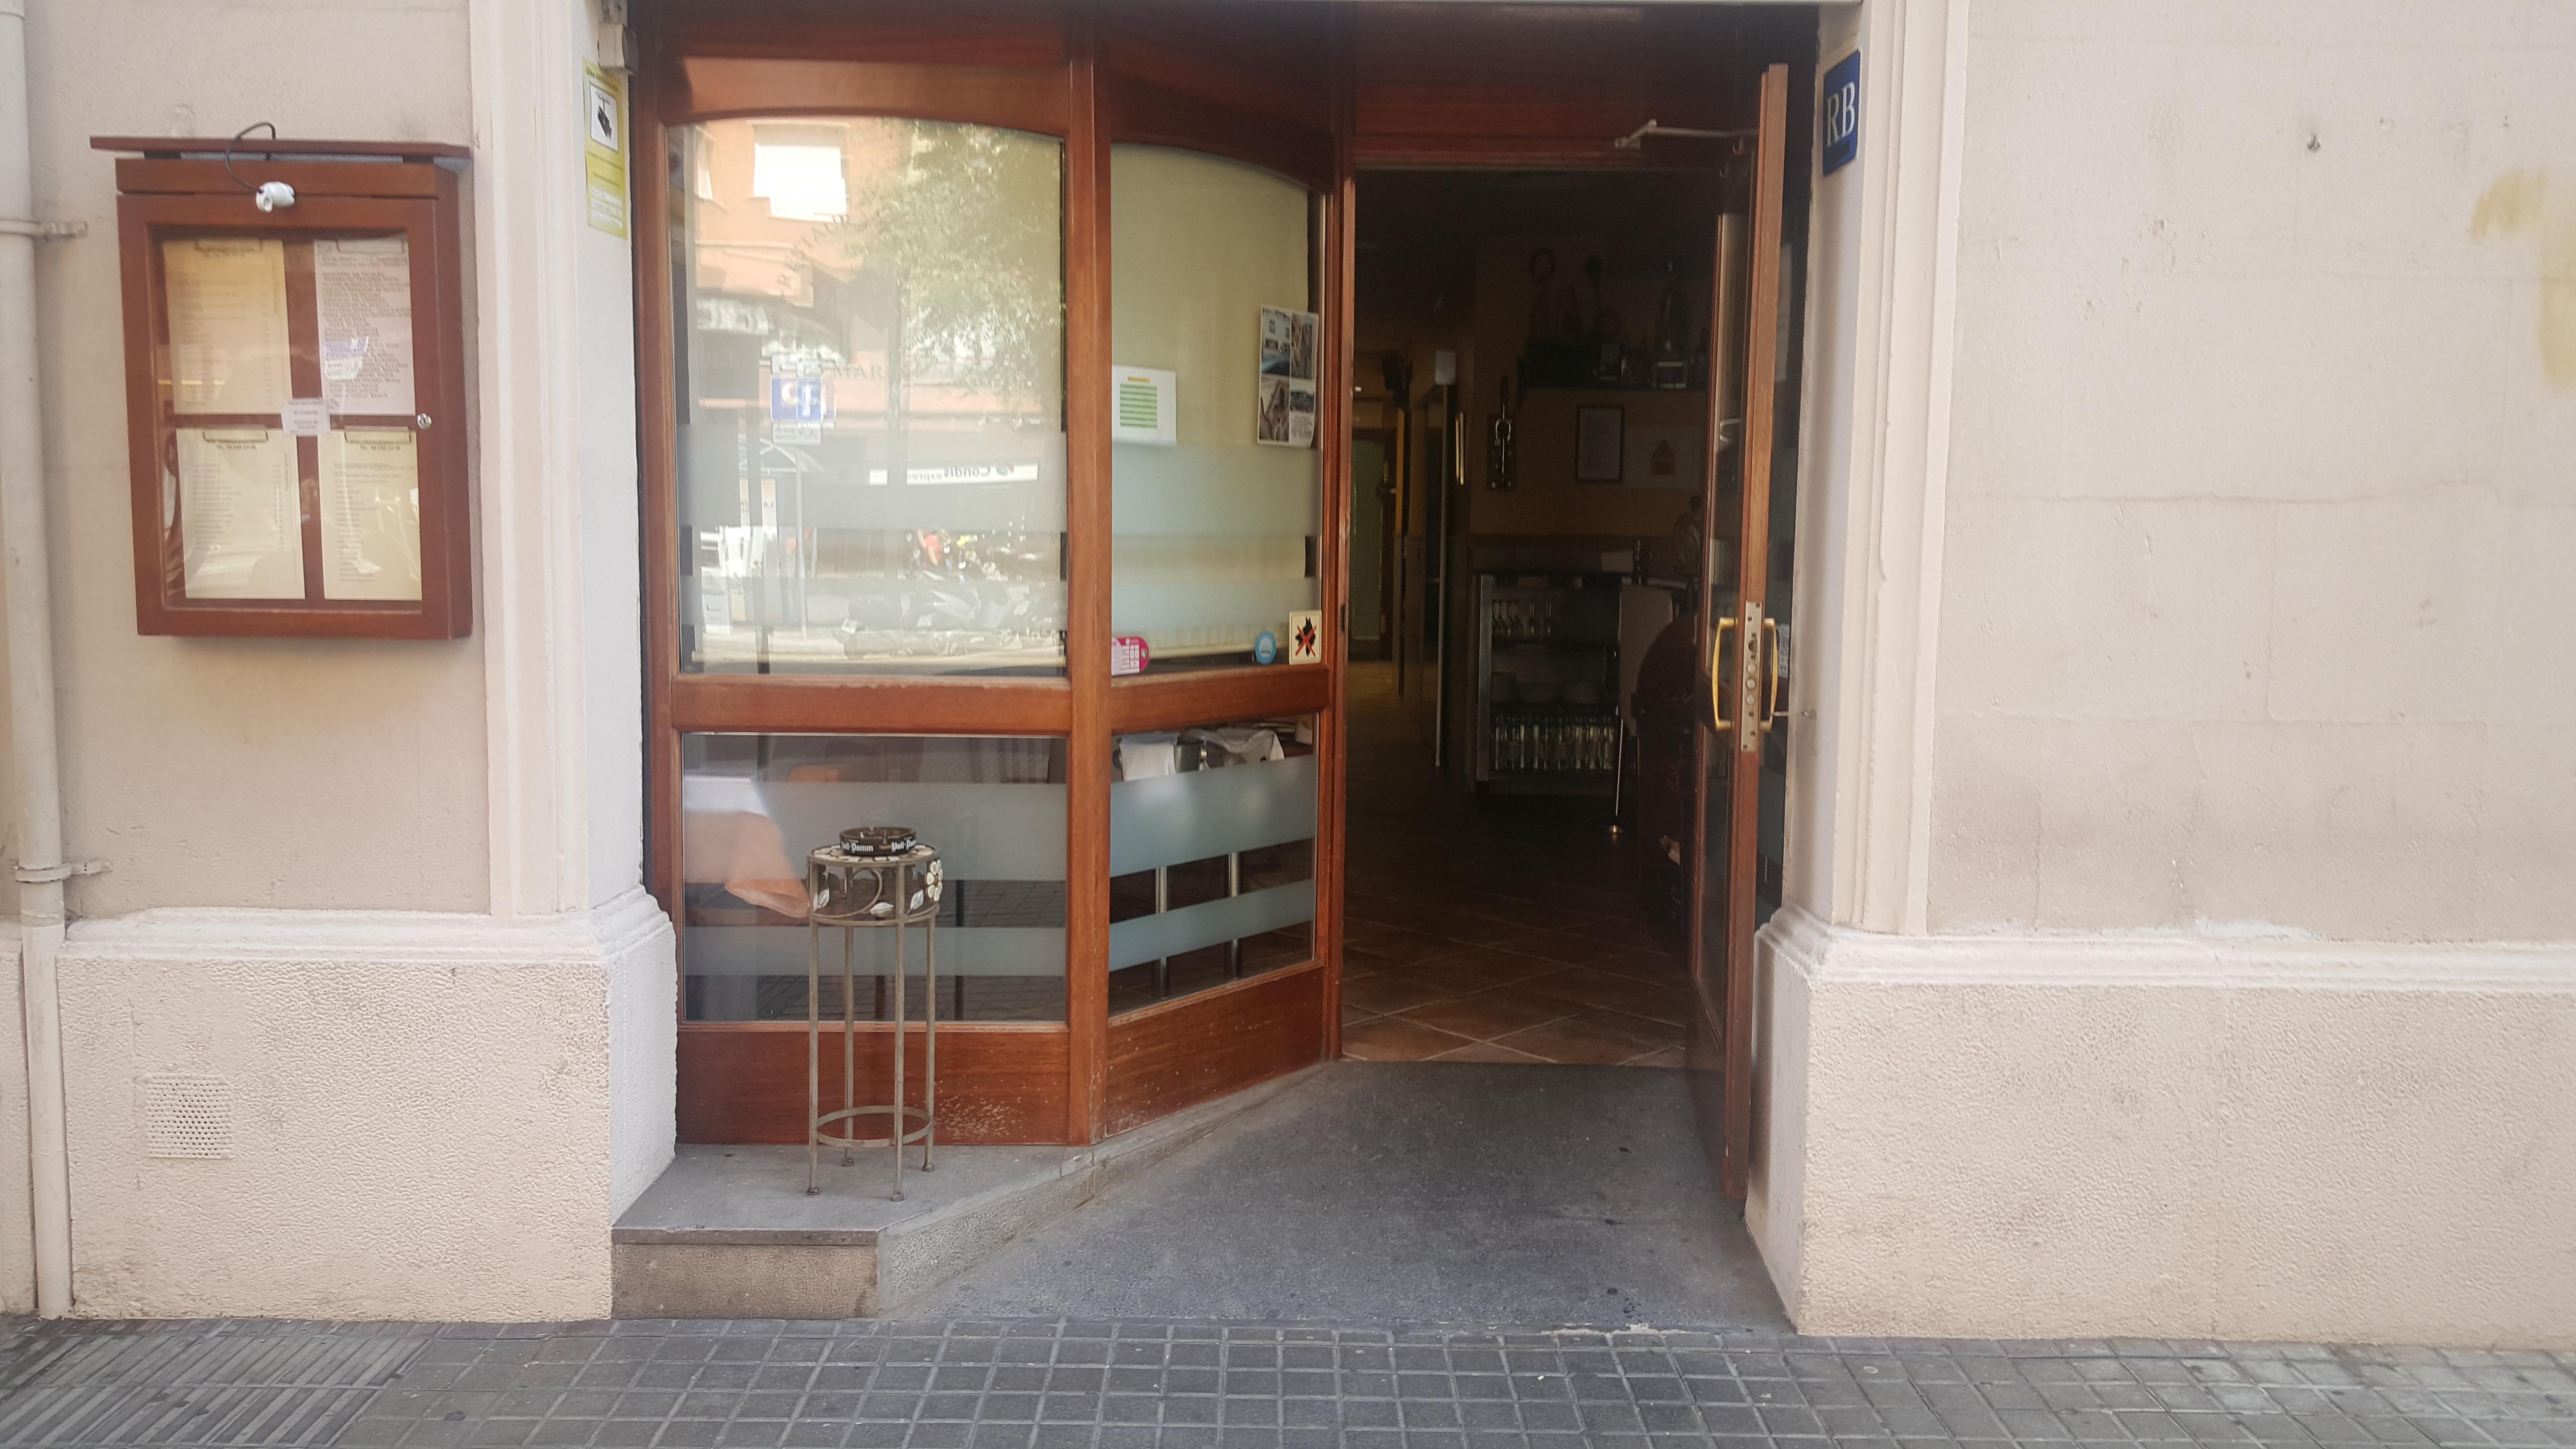 restaurante marin QrCarta